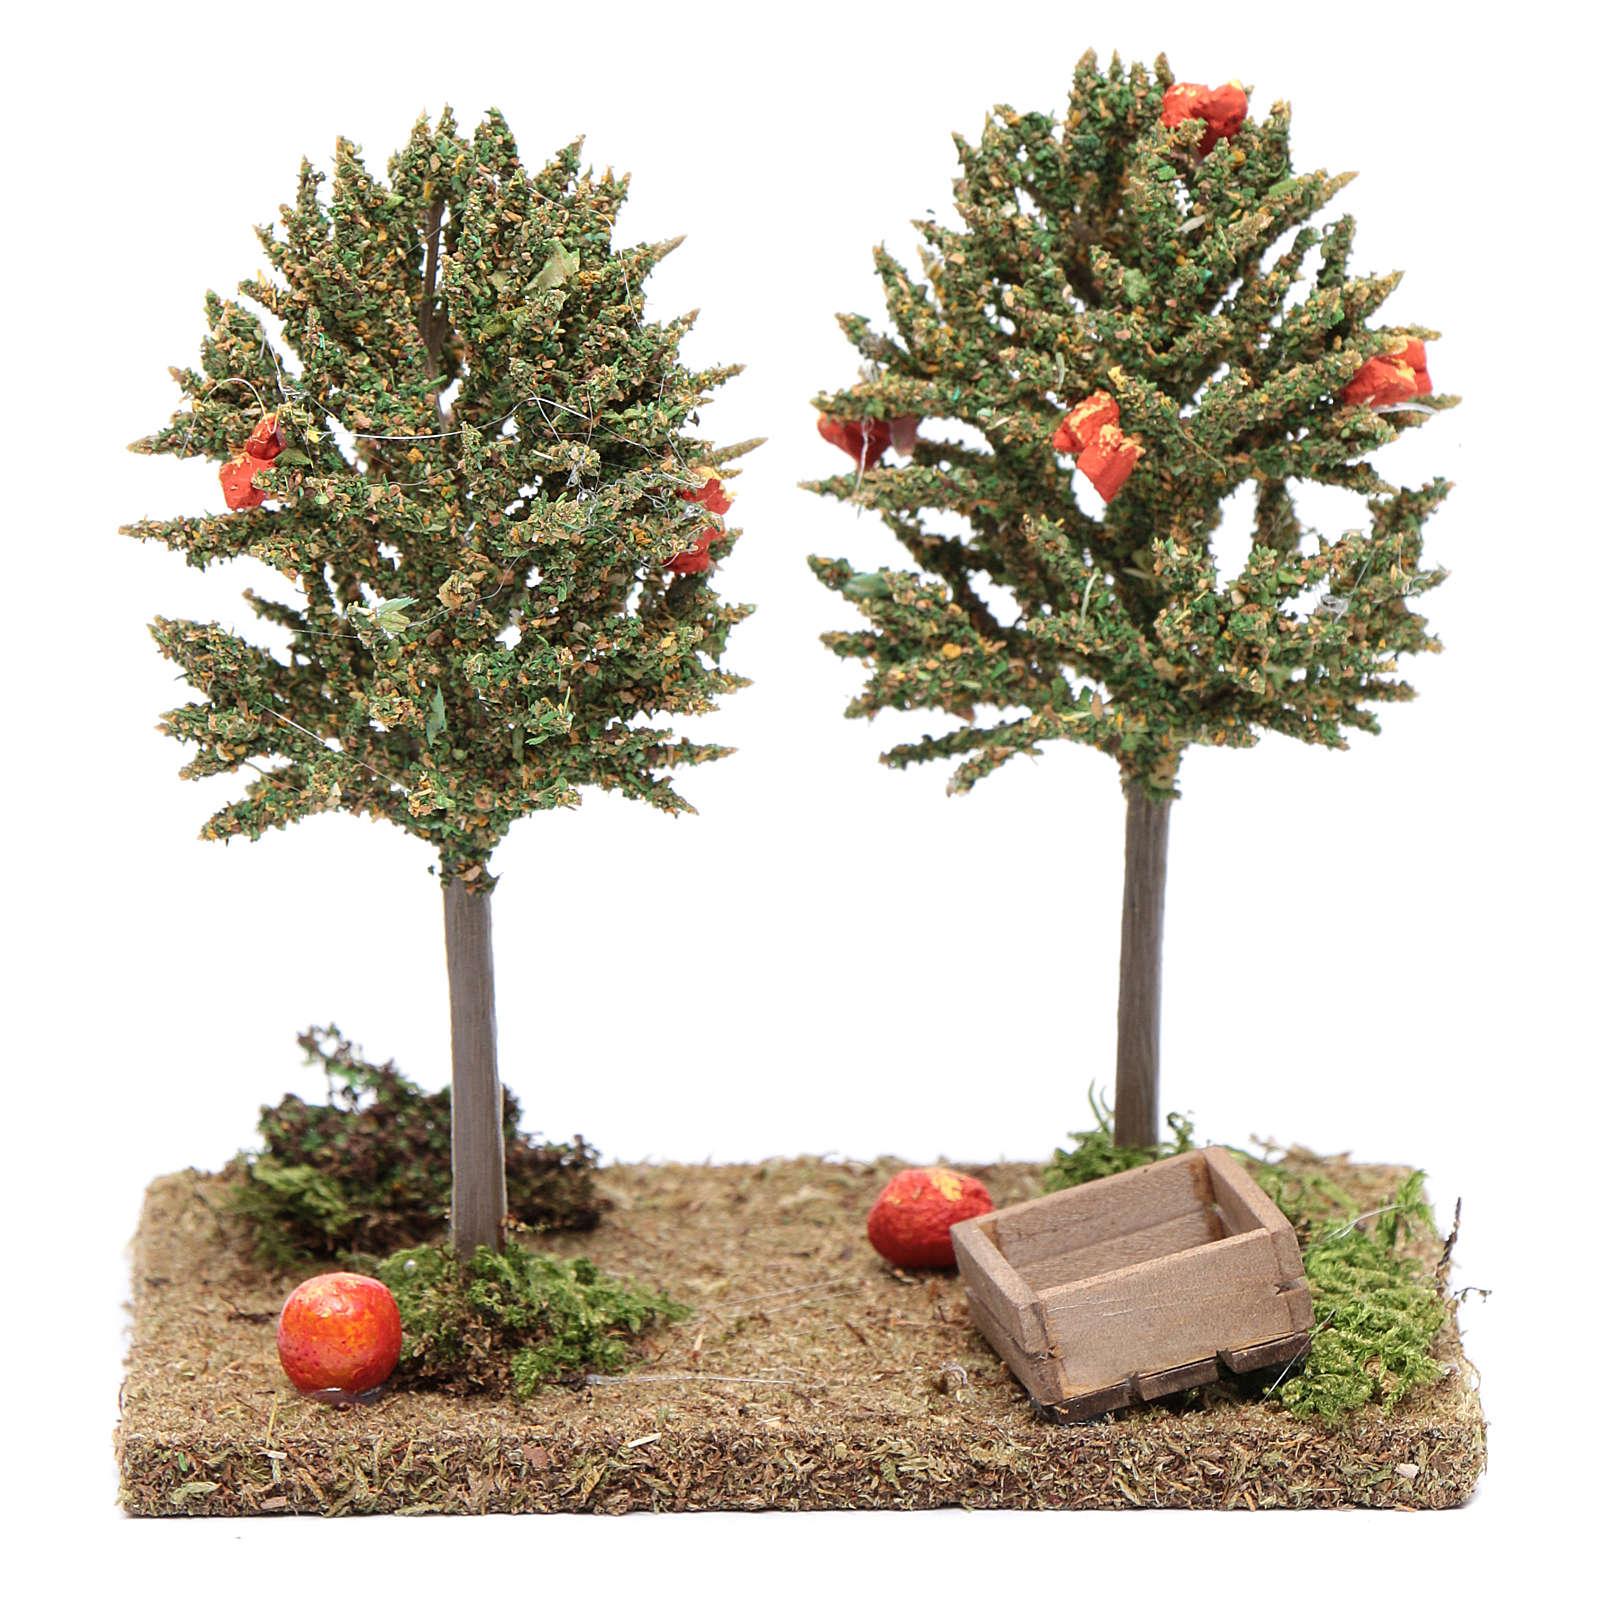 Nativity scene orange trees 15x15x10cm 4